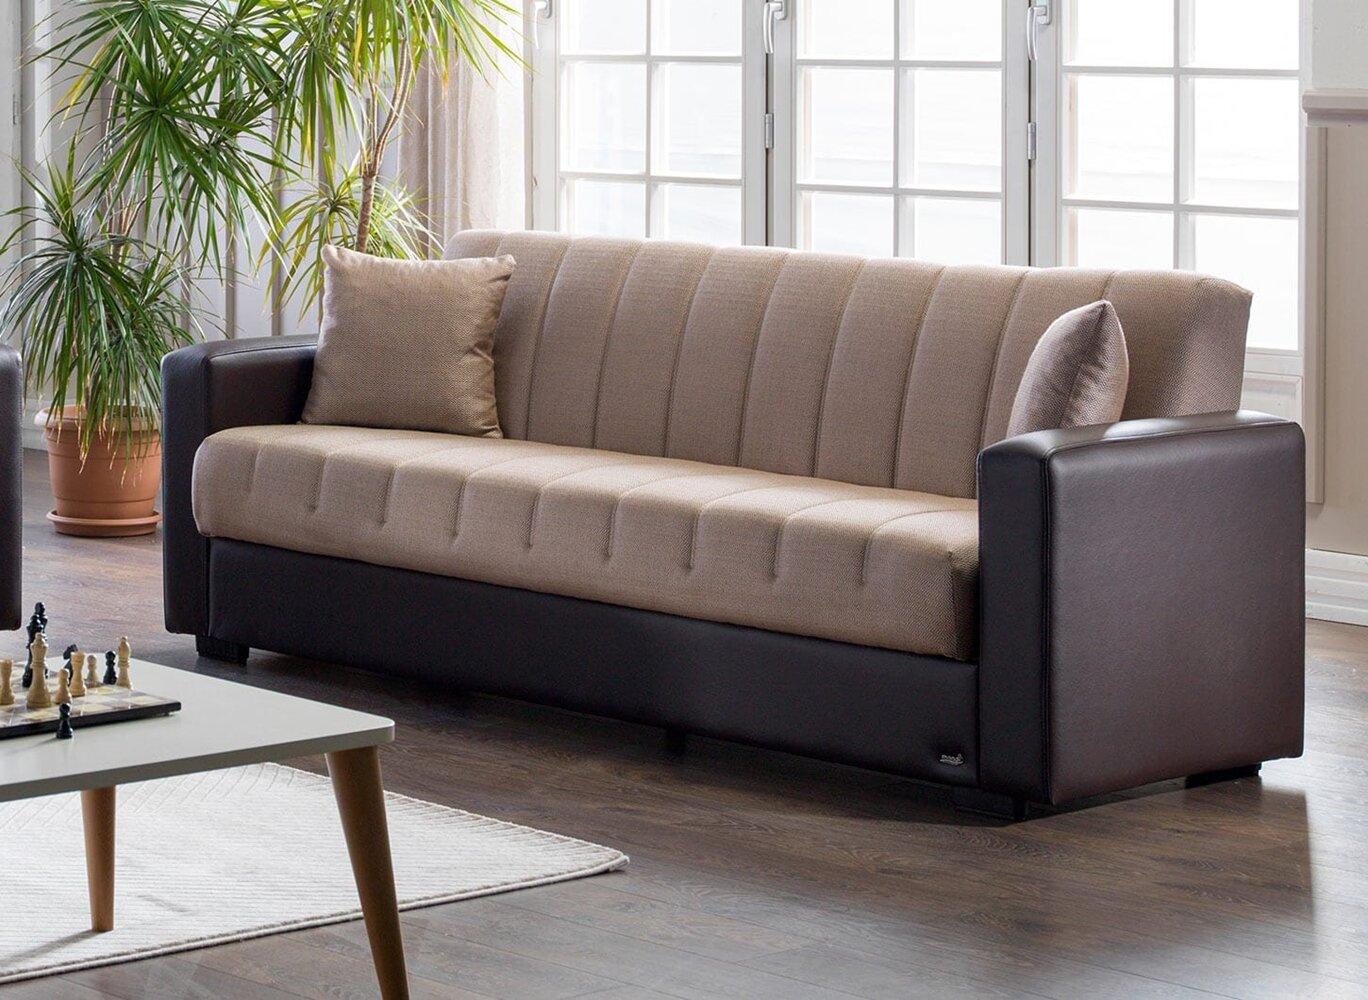 Ebern Designs Aaliyahrose 88 6 Square Arm Sofa Bed Wayfair